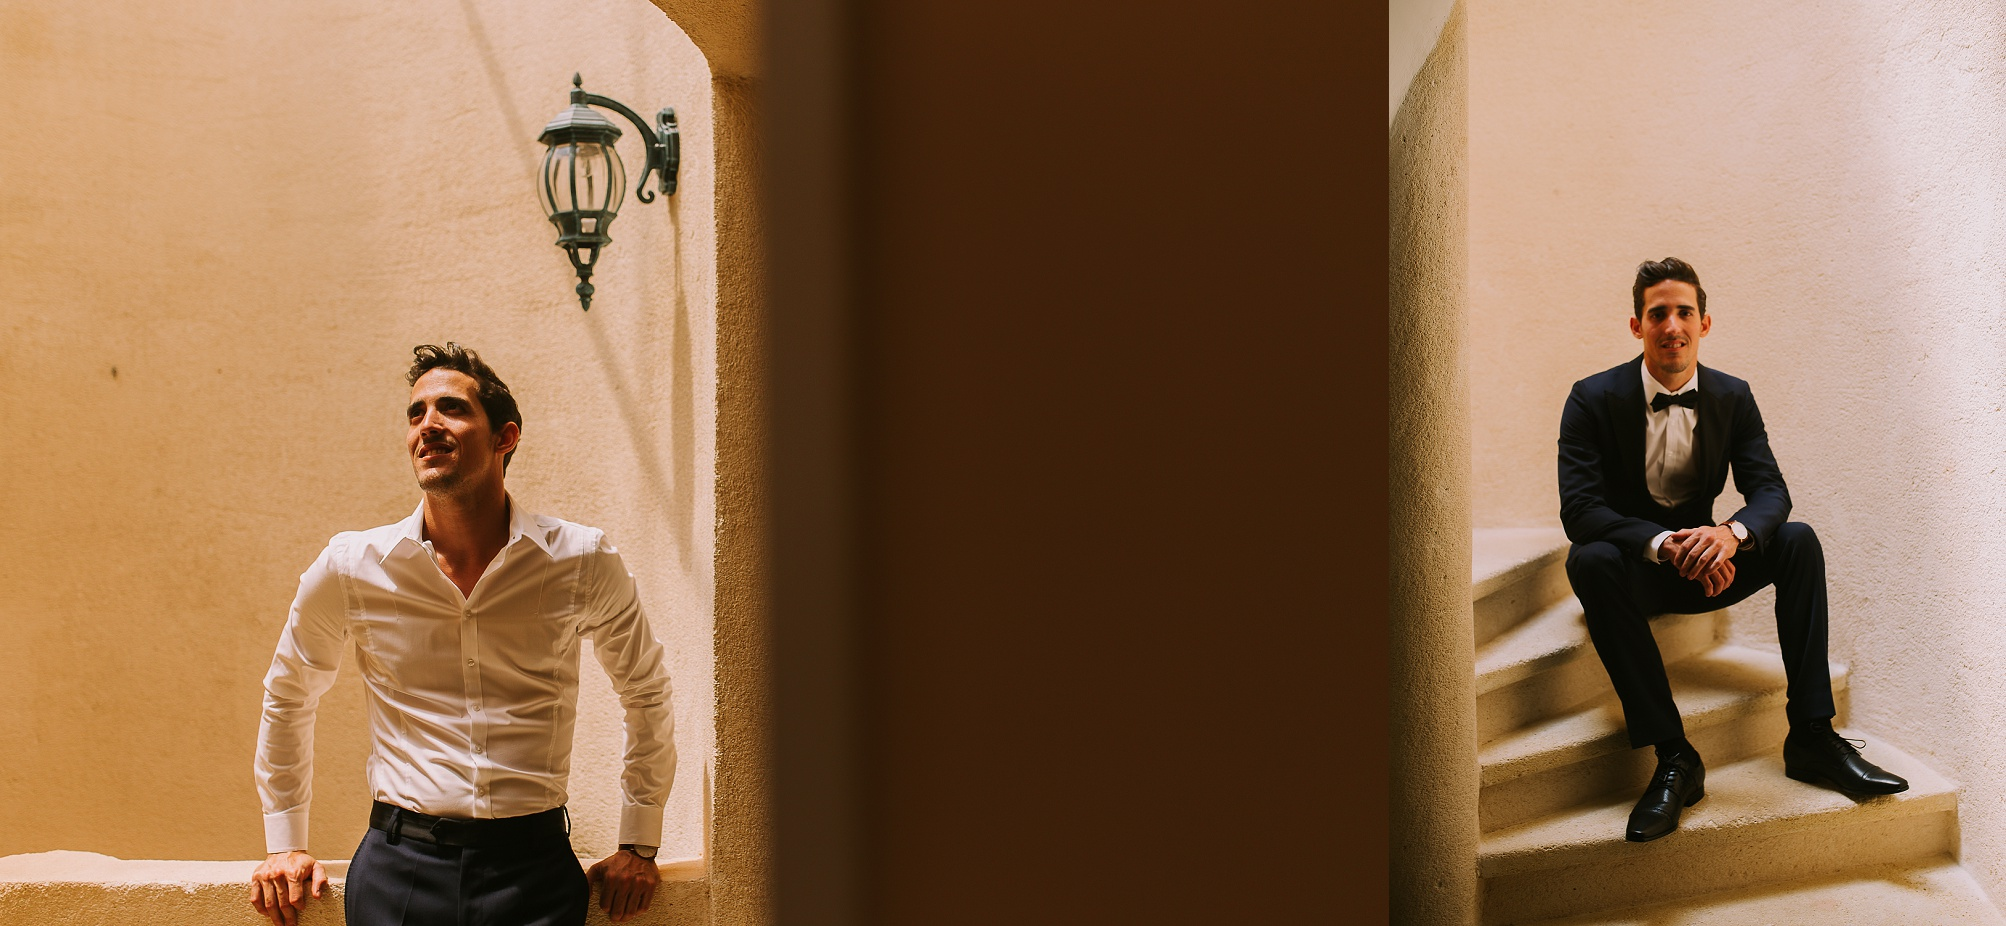 katerynaphotos-mariage-photographe-puyloubier-provence-aix-en-provence-sud-de-la-france_0325.jpg